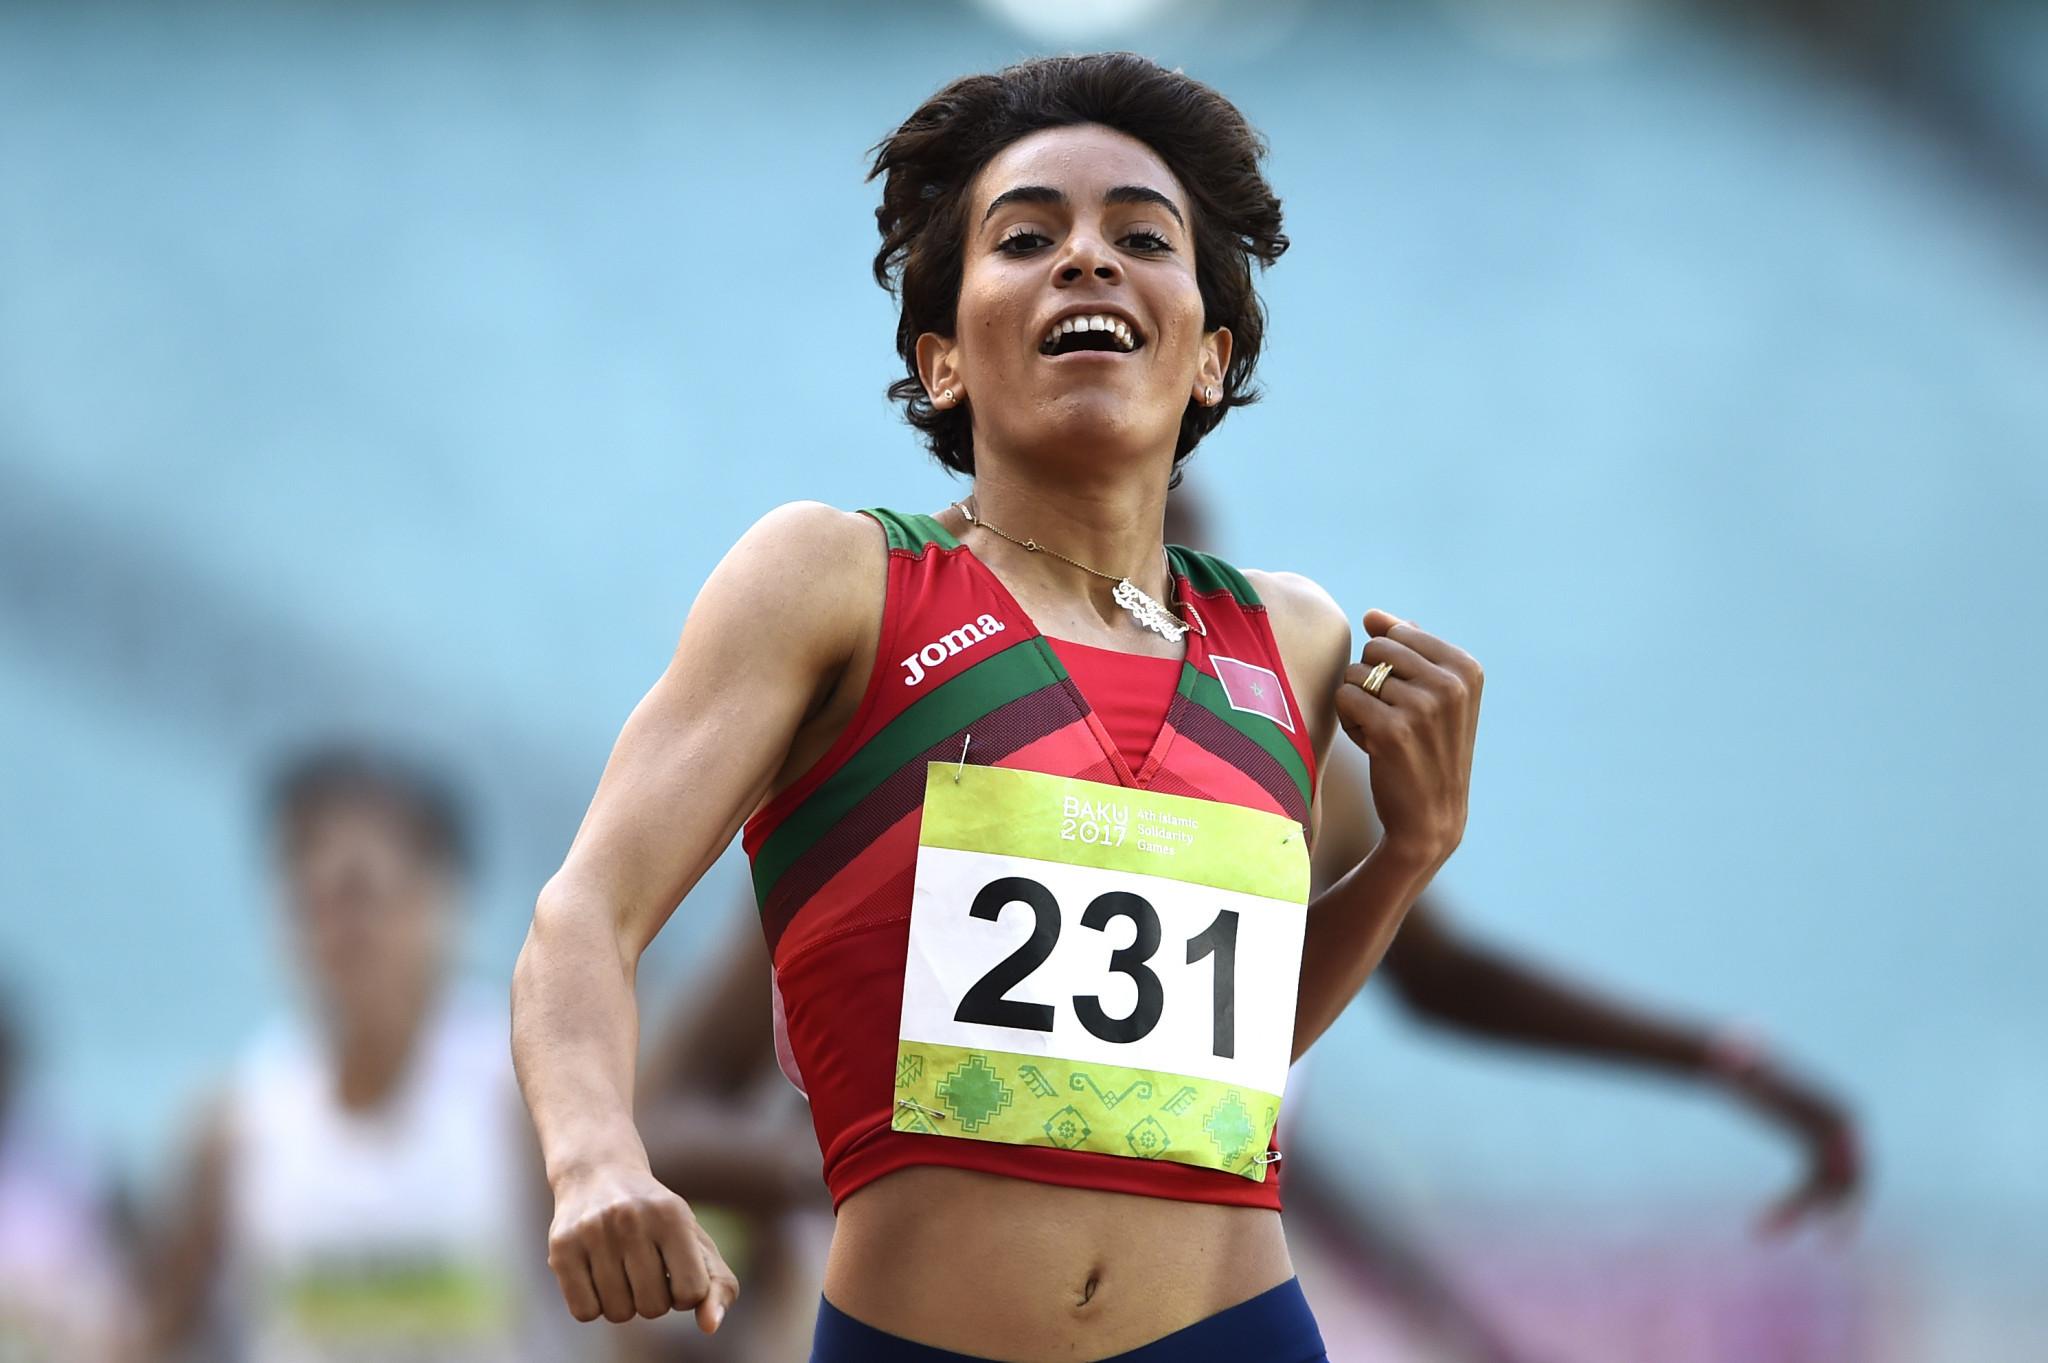 Berabah wins exciting long jump gold at Mediterranean Games